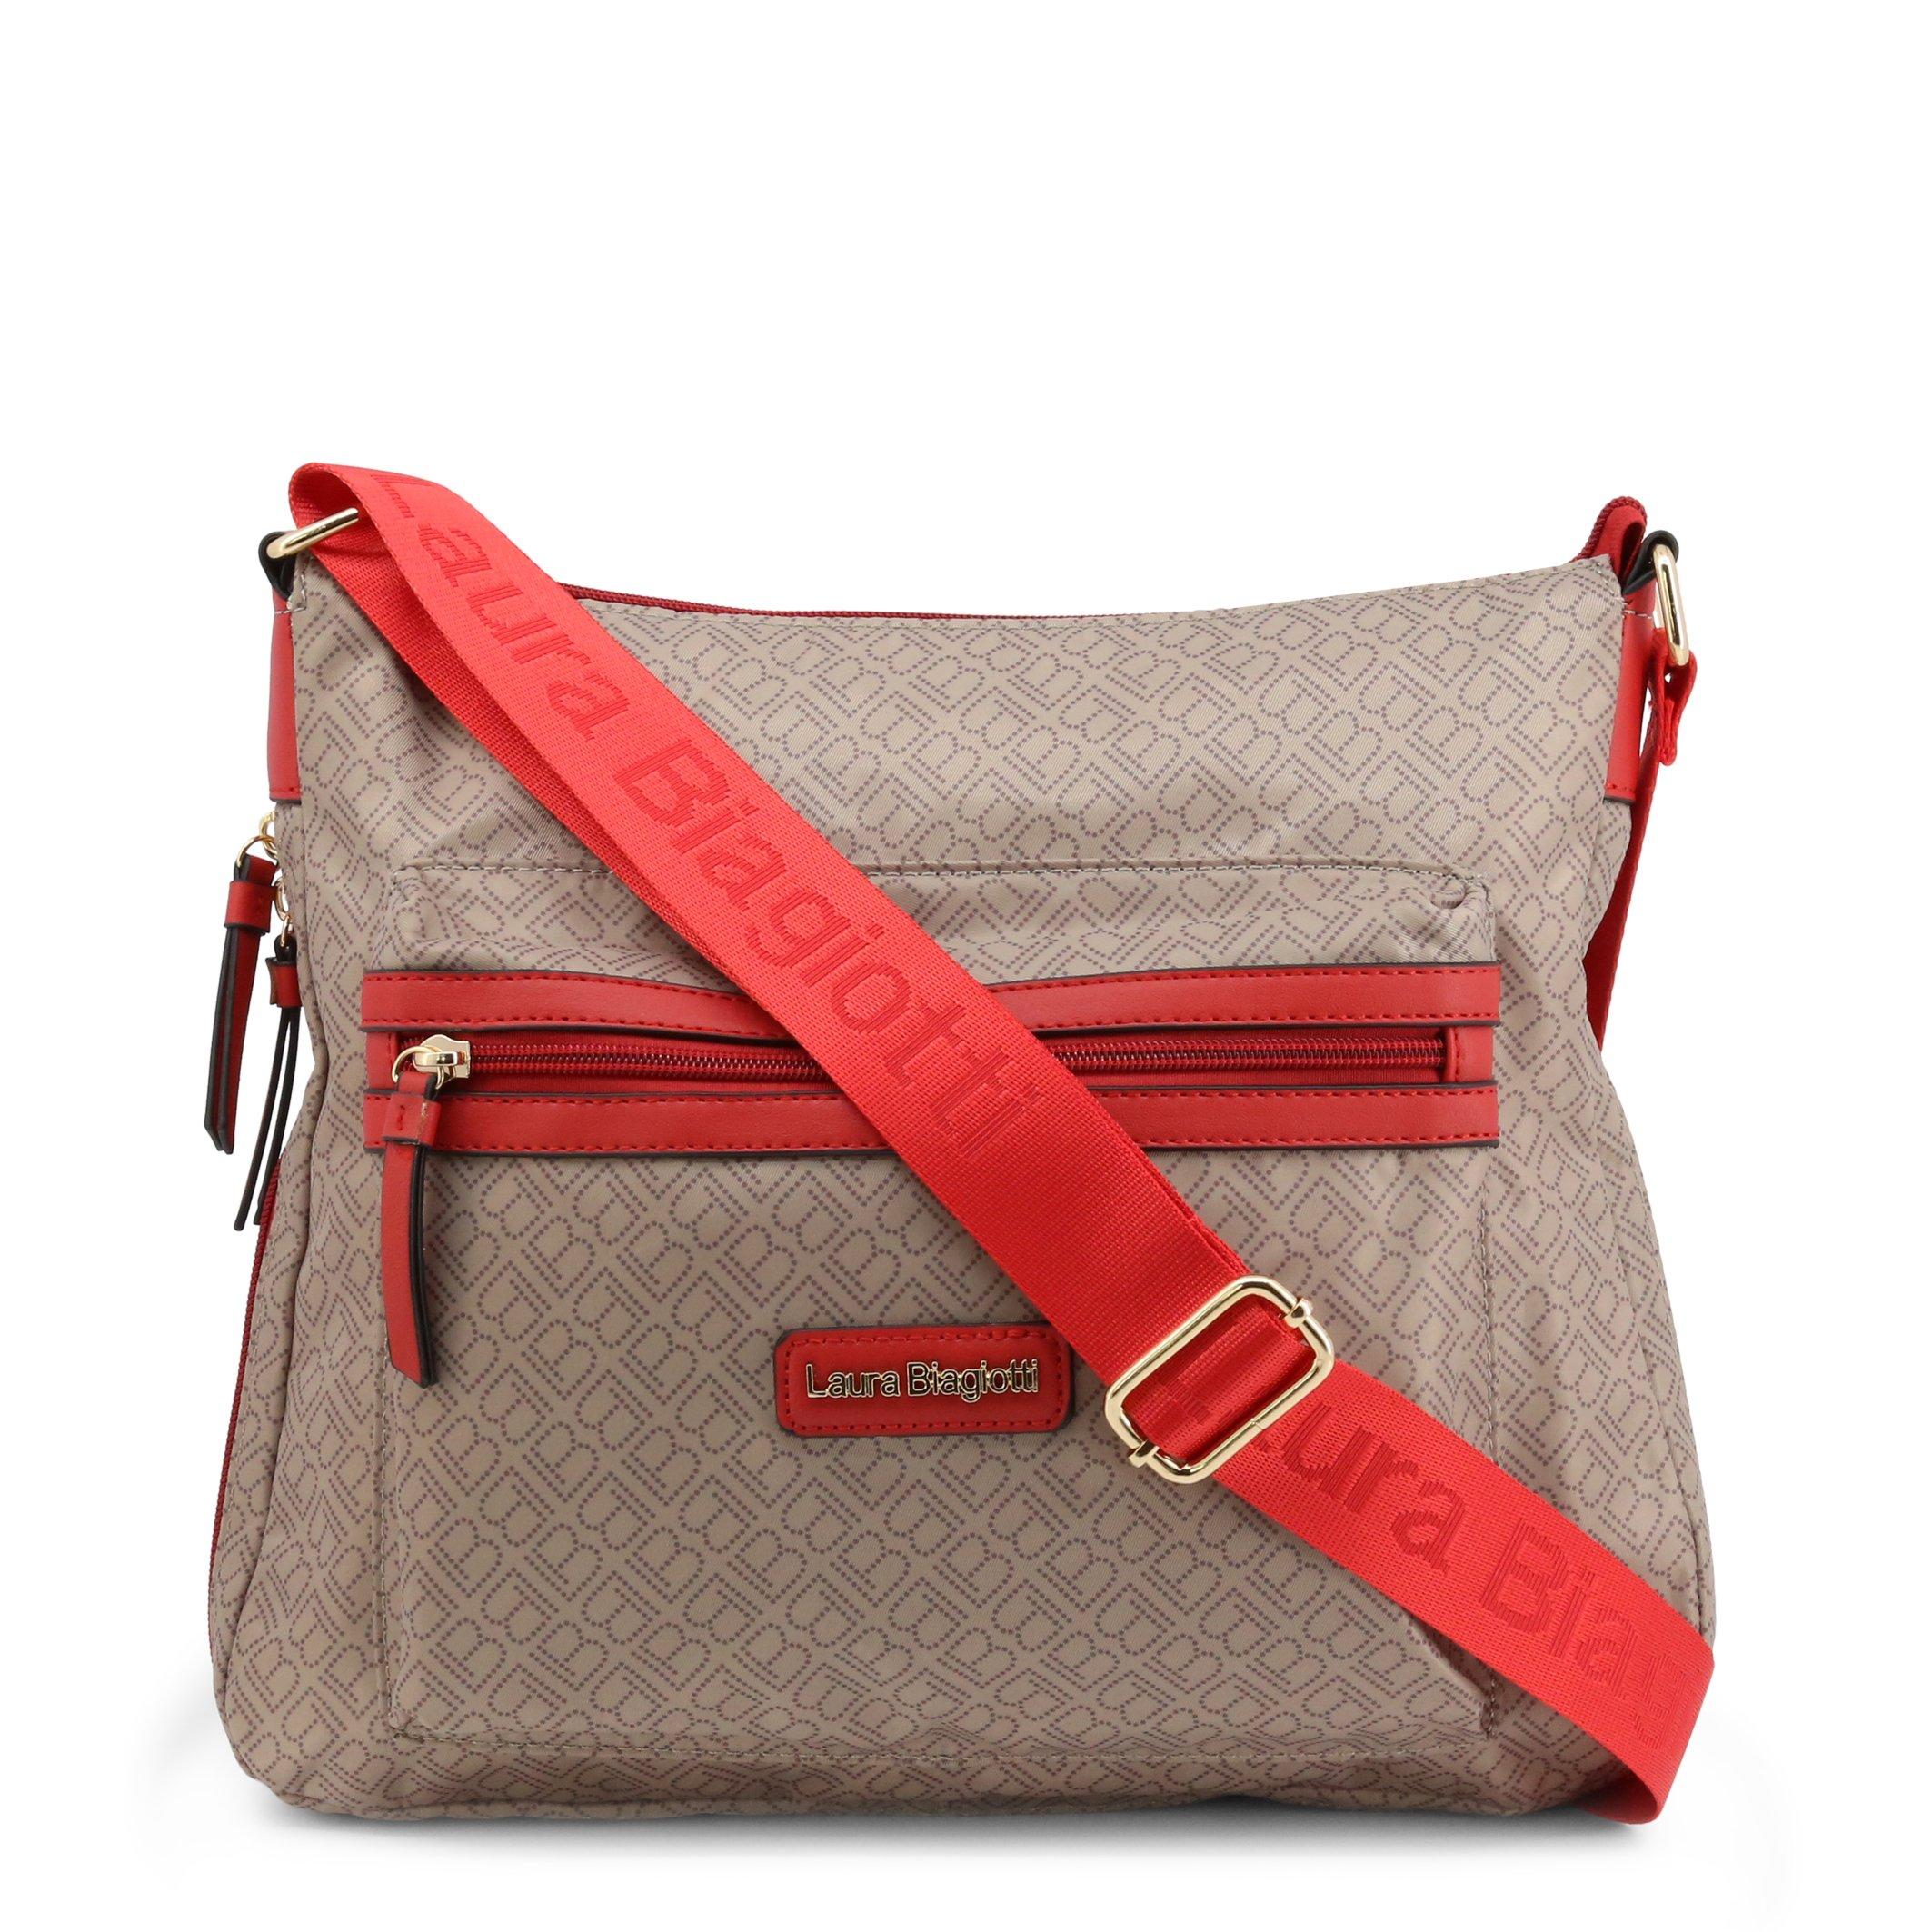 Laura Biagiotti Women's Crossbody Bag Brown Thia-105-10 - brown-3 NOSIZE